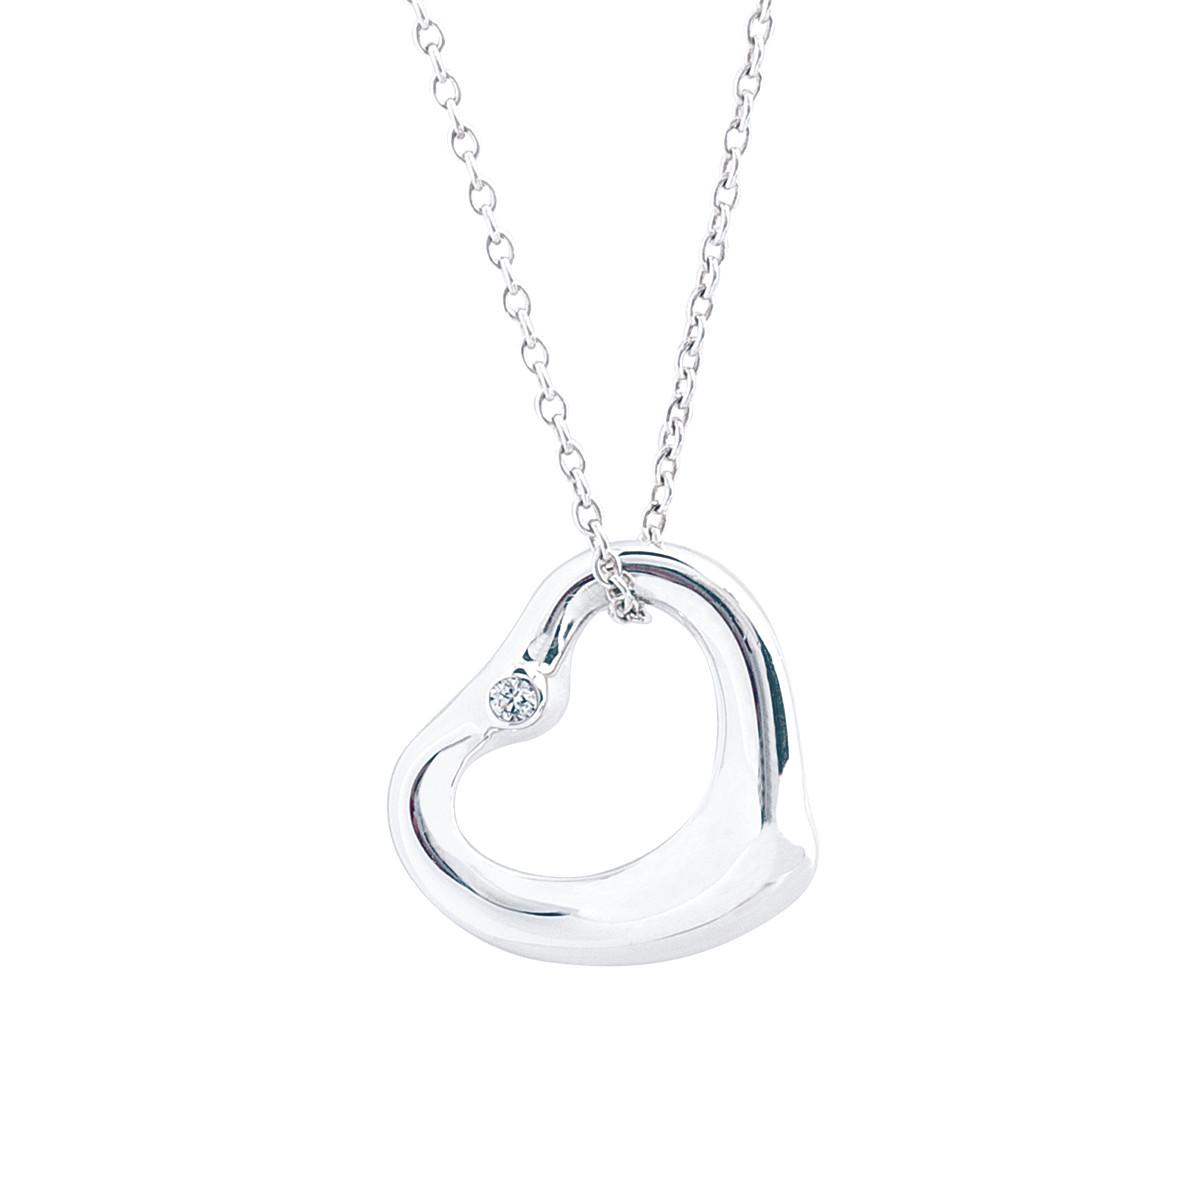 a5a74cd51 Vintage Tiffany & Co. Elsa Peretti Open Heart Diamond Pendant Gallery Image